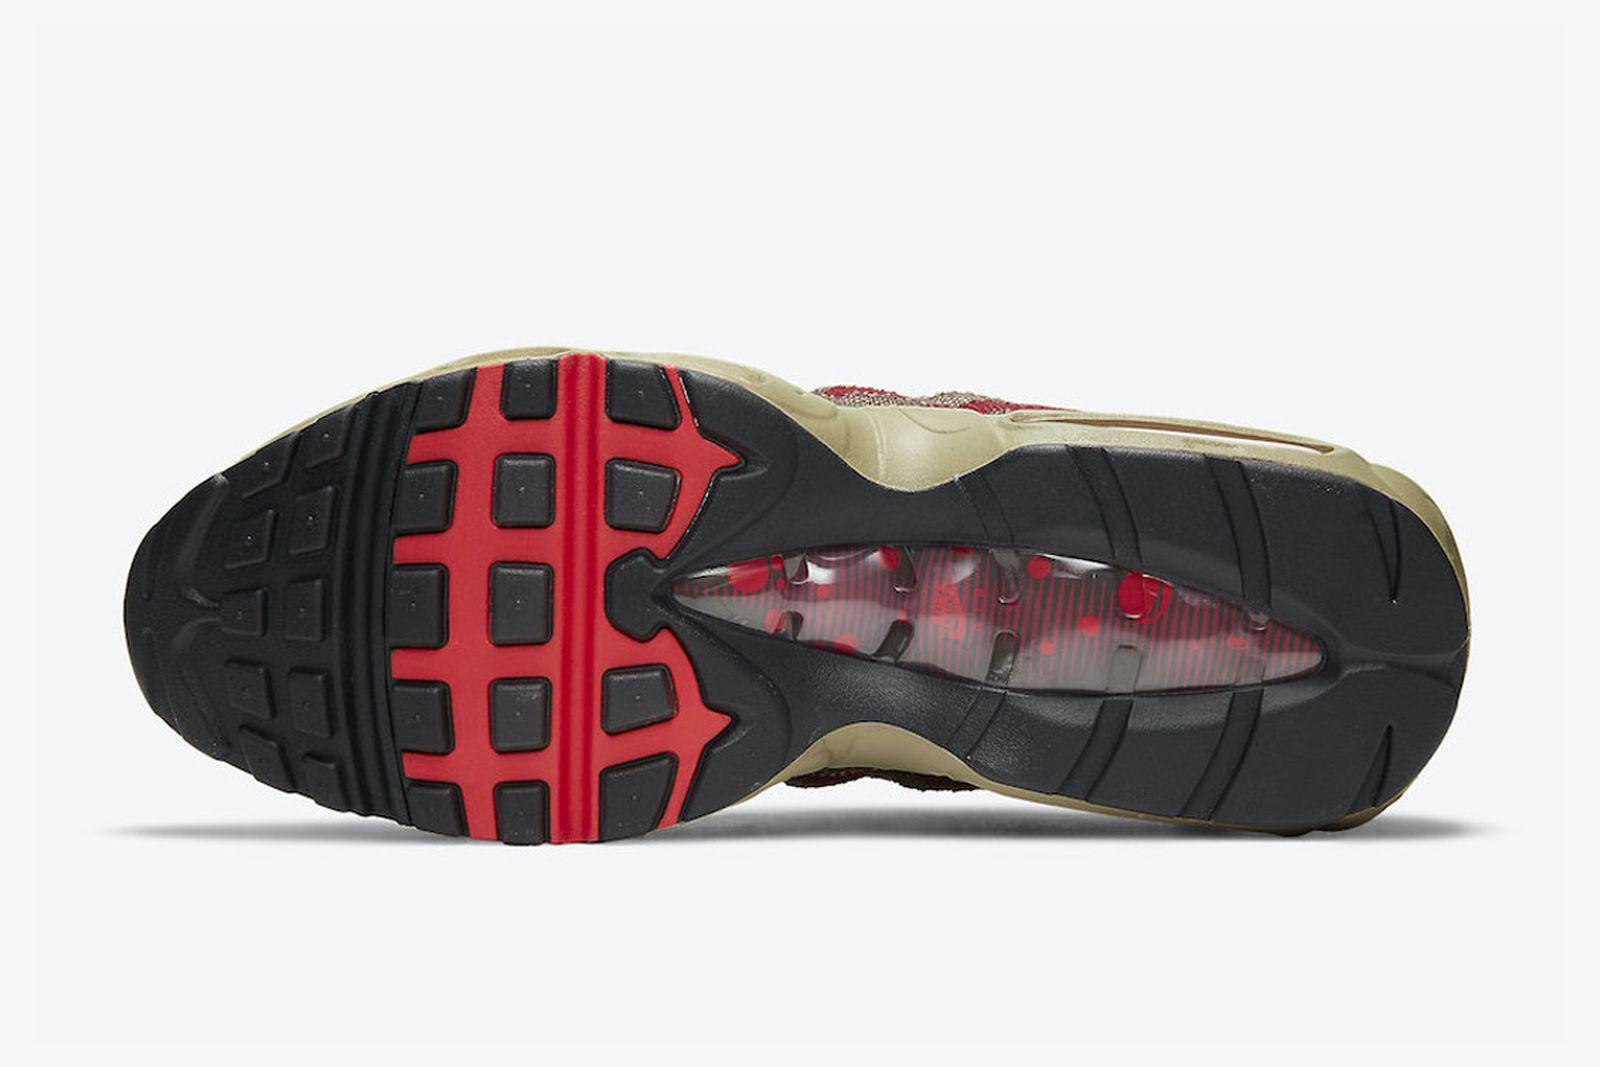 Nike Air Max 95 Freddy Krueger product shots